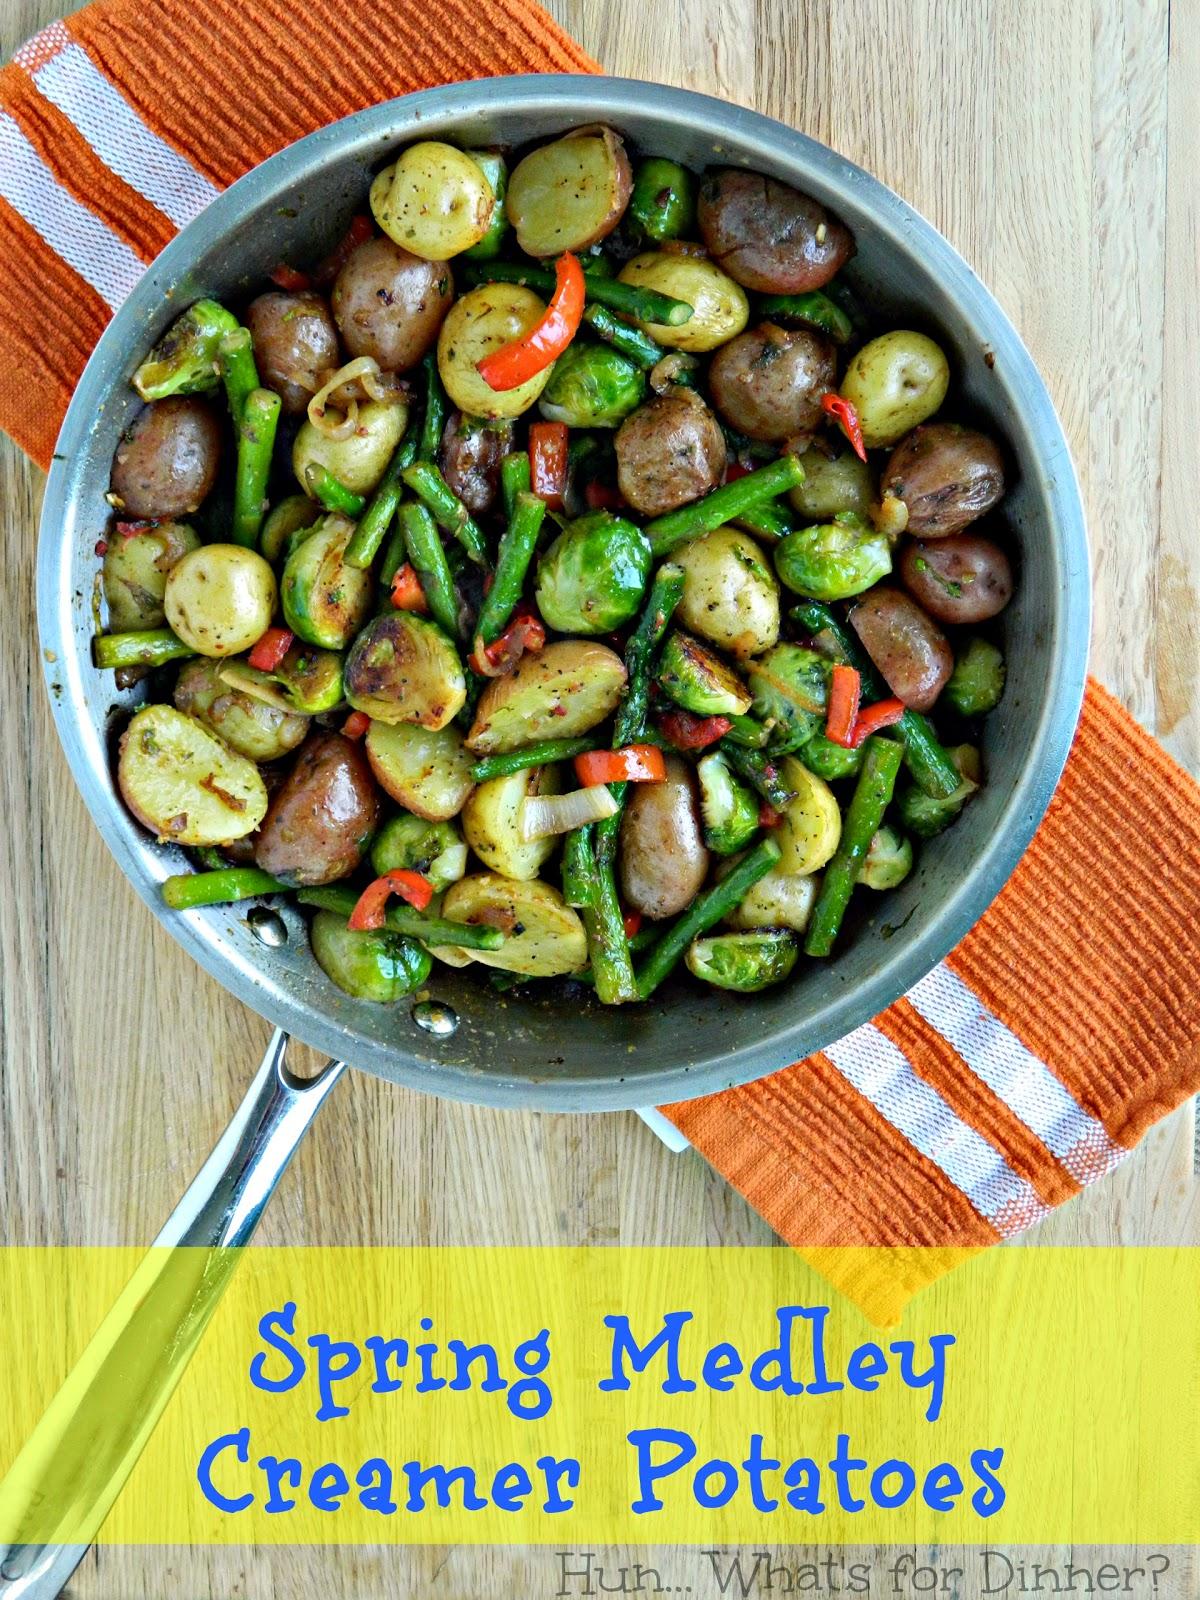 Spring Medley Creamer Potatoes- The Little Potato Company